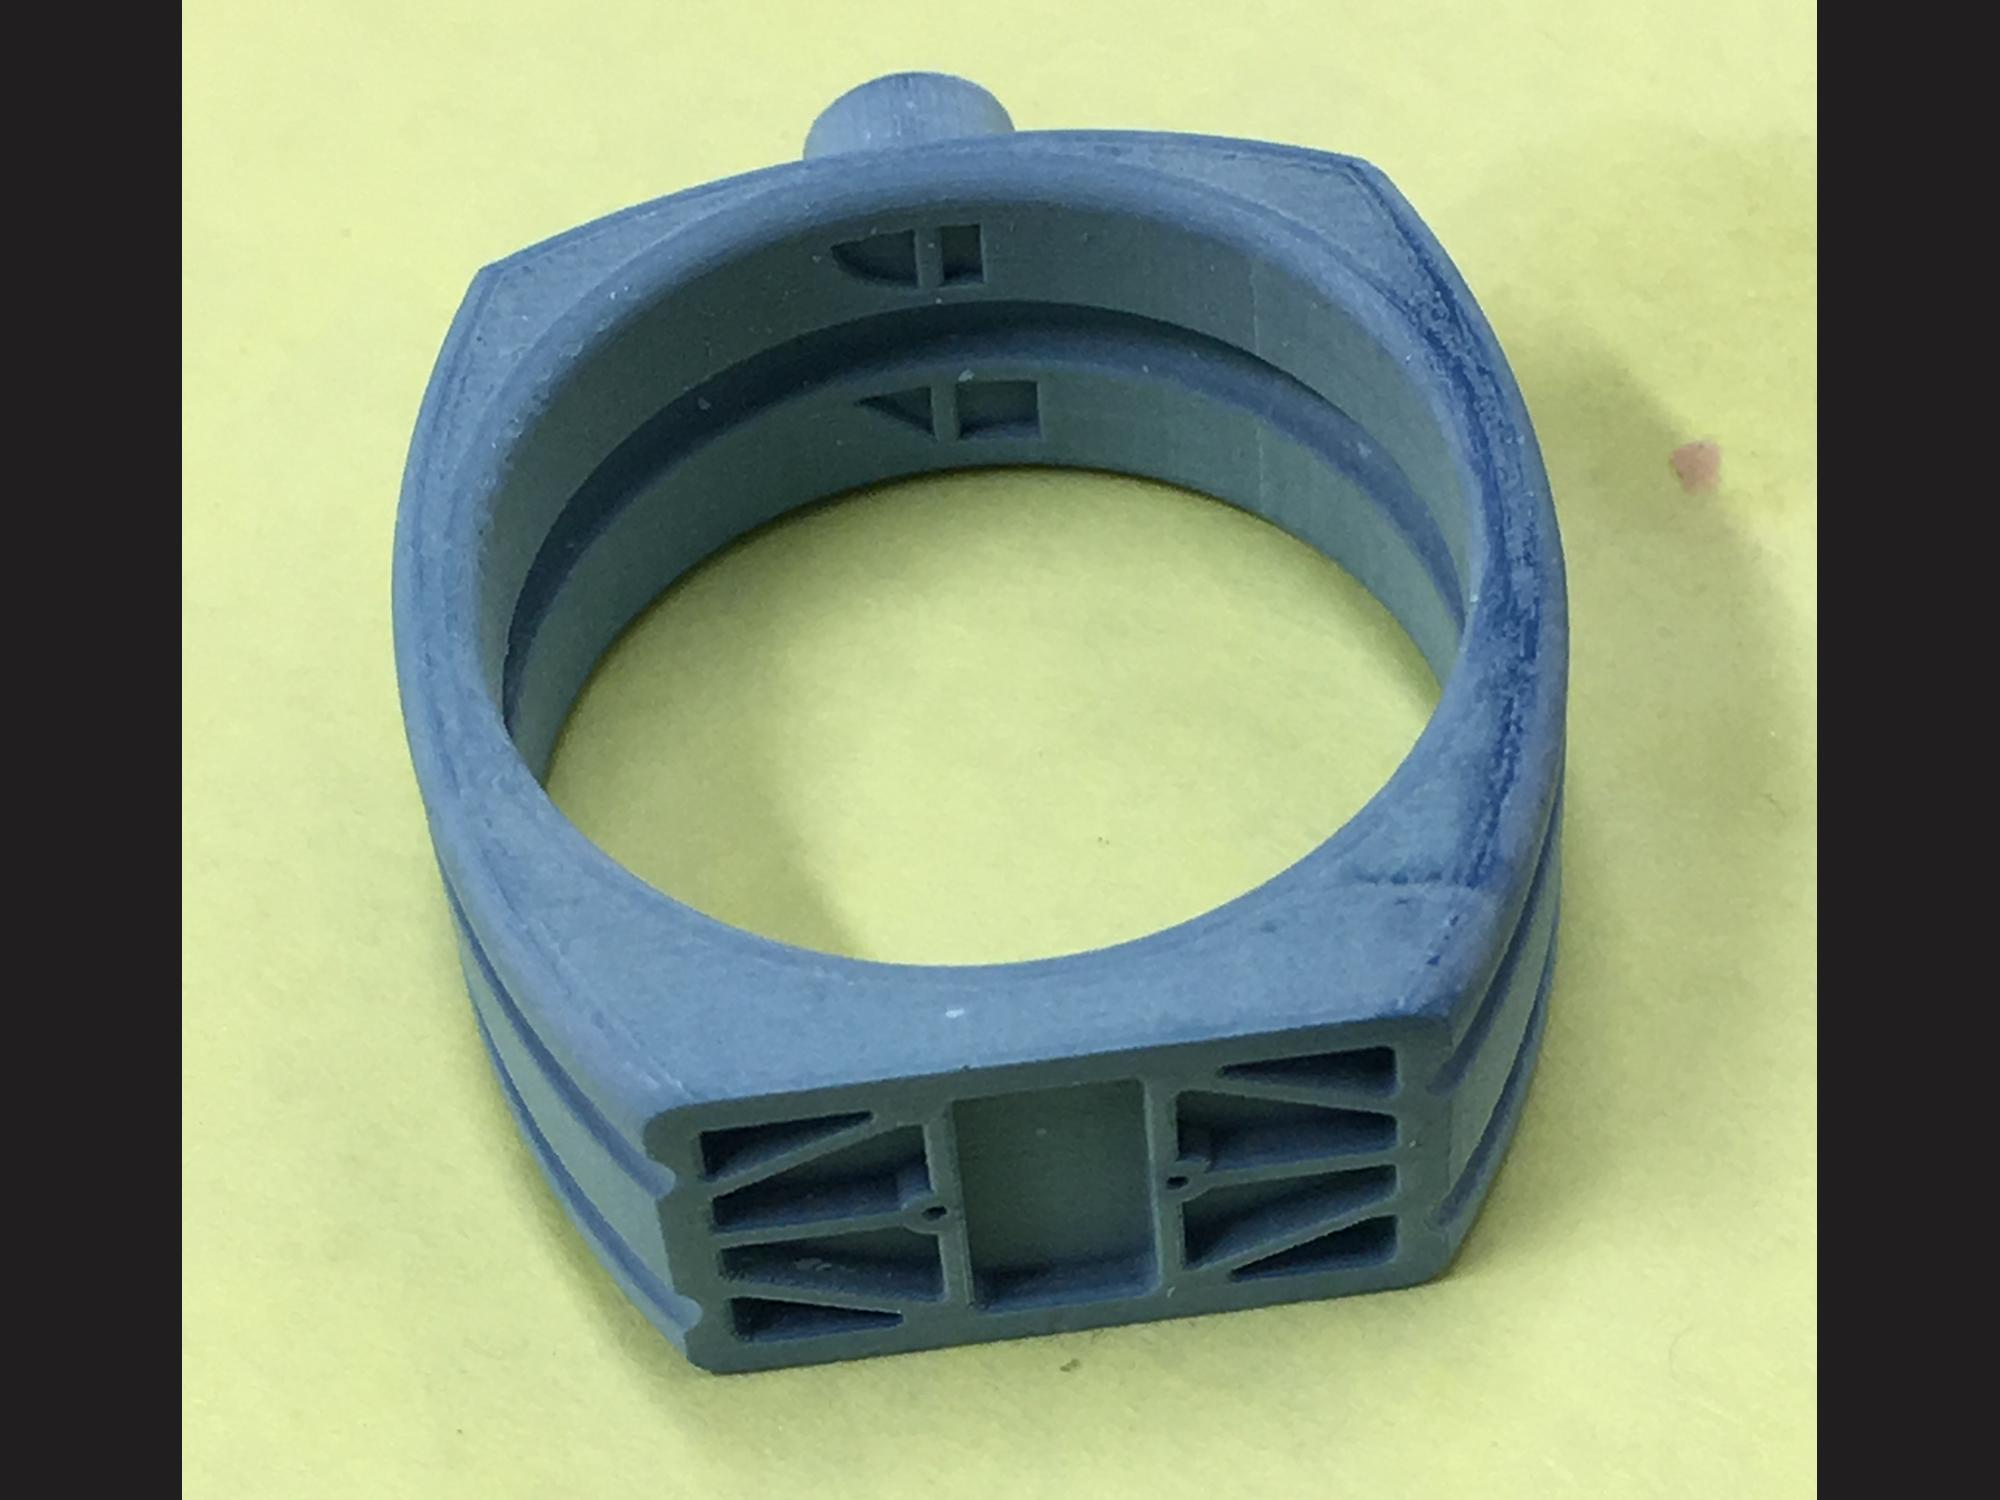 3d printed wax model